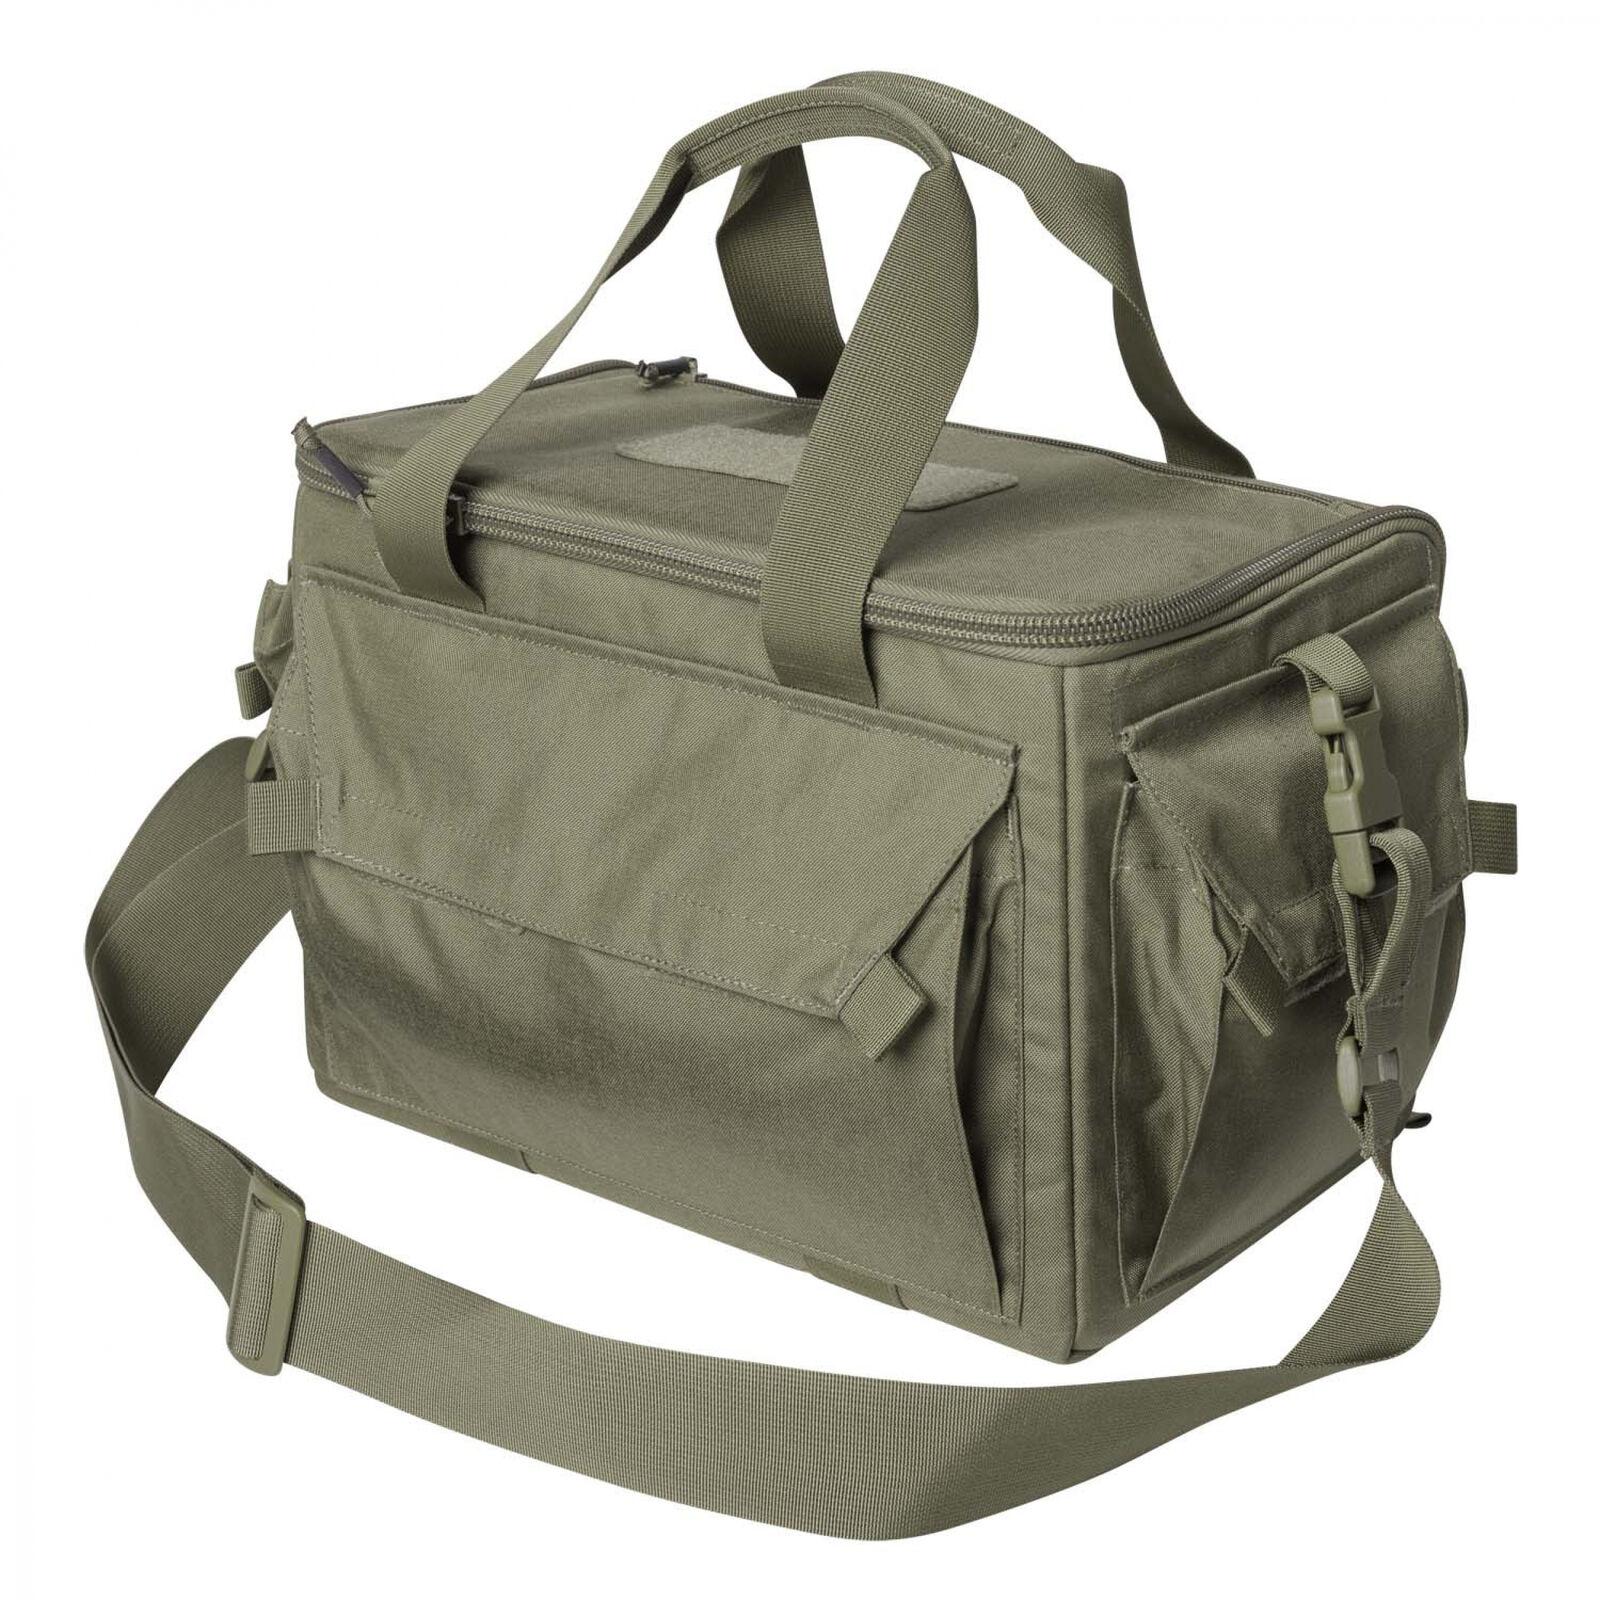 Helikon-Tex Range Bag Magazintasche Magazintasche Magazintasche - Cordura - Adaptive Grün 7d8480